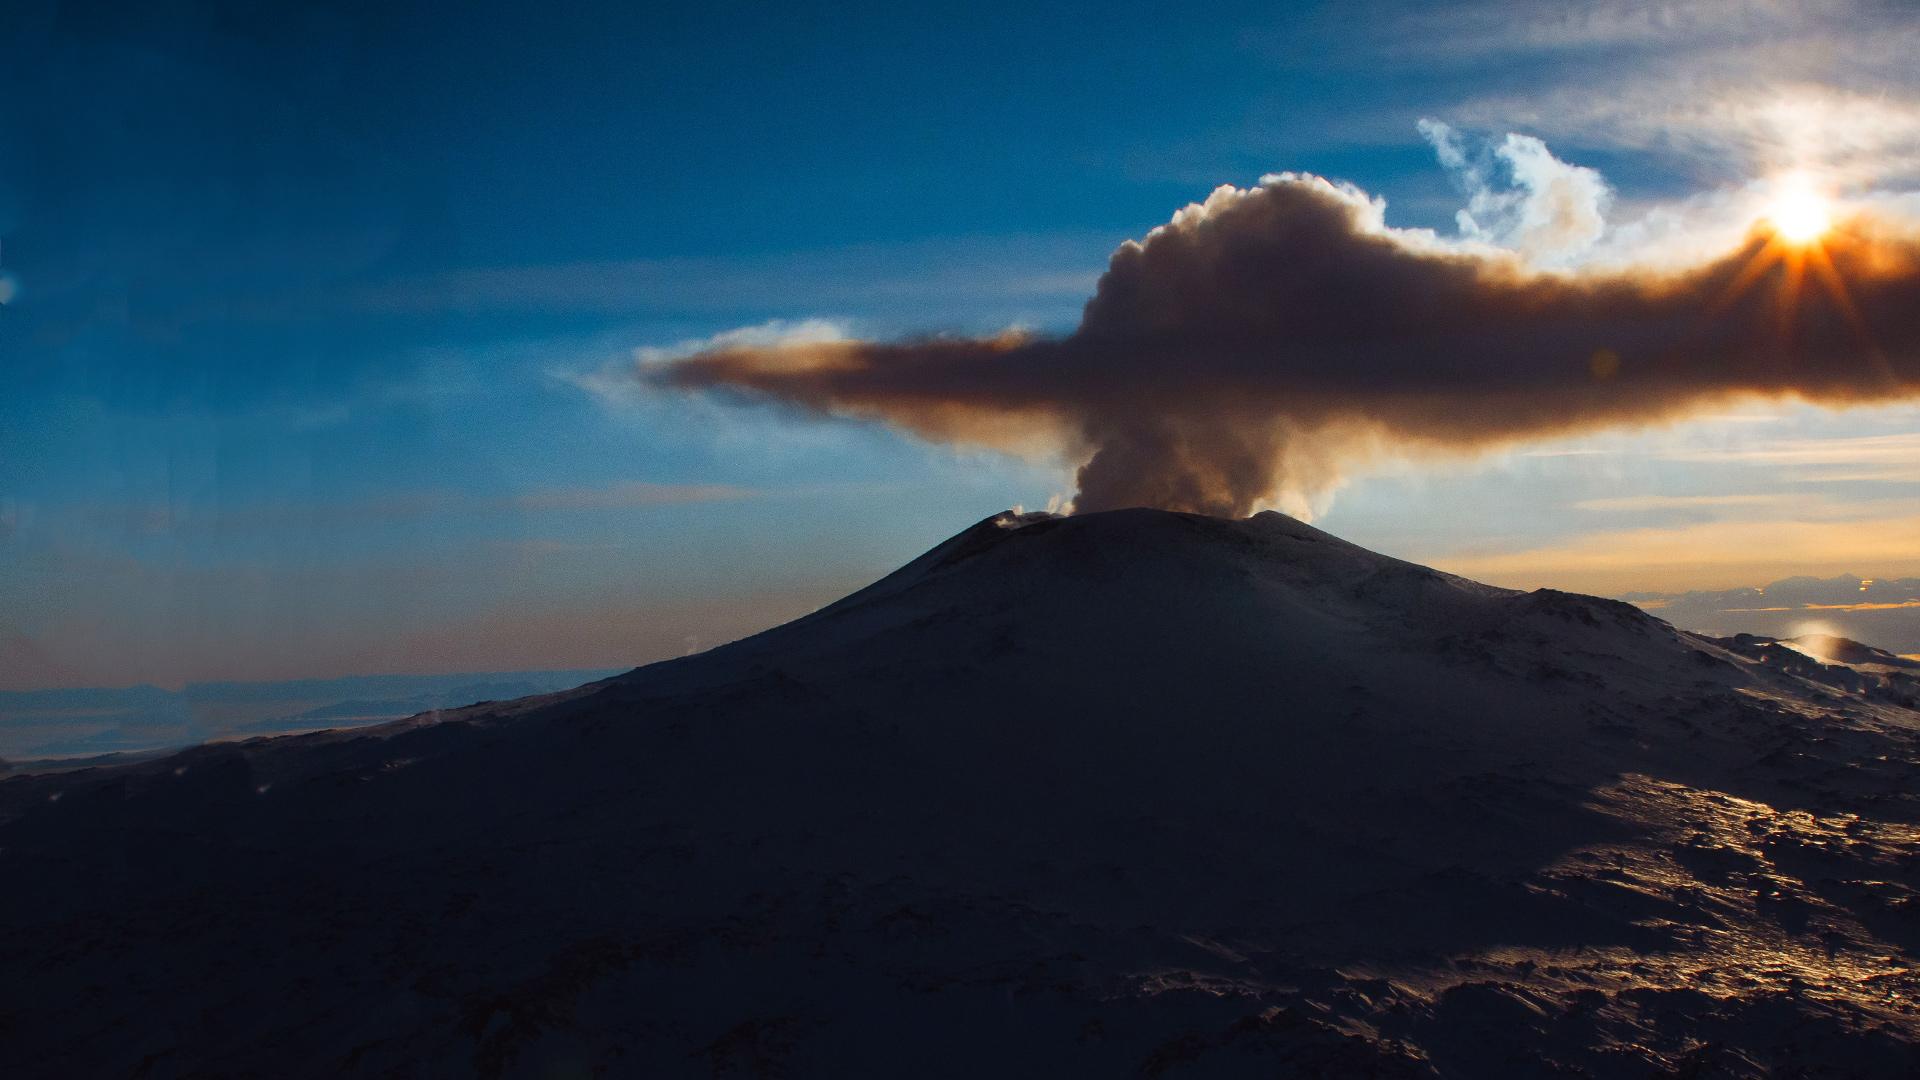 Exploring Antarctica's Active Volcano Mt. Erebus